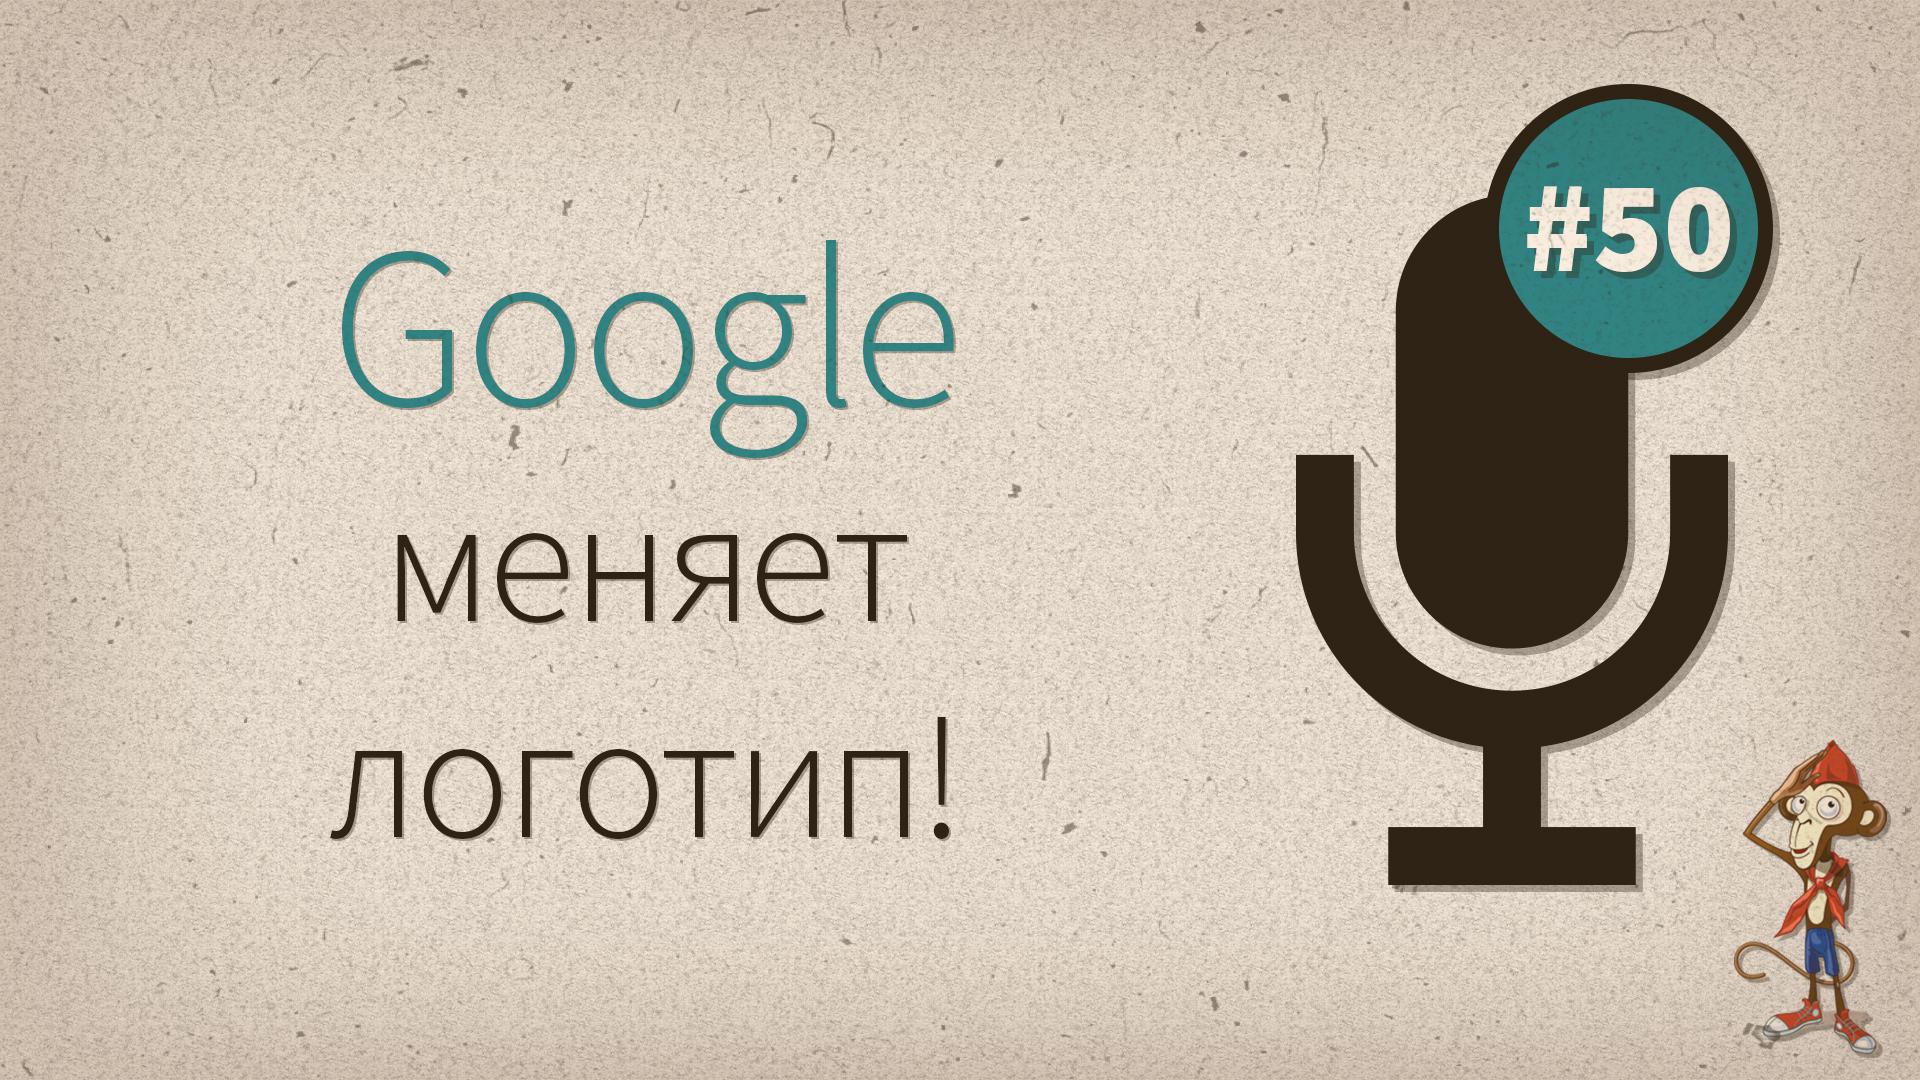 Google меняет логотип! — подкаст #50